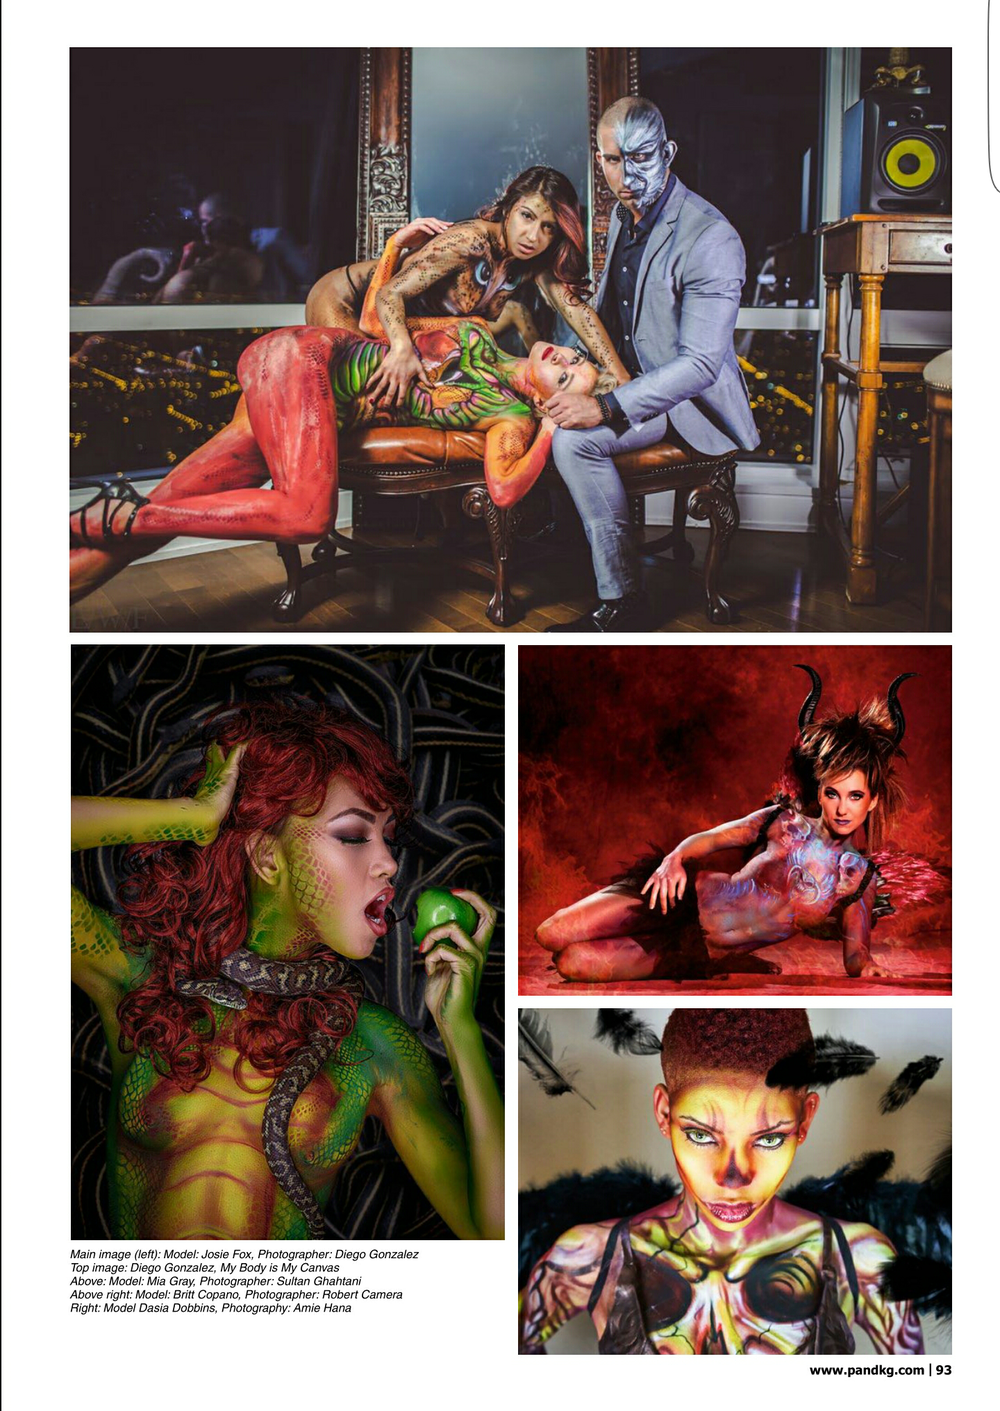 photo- Sultan Ghatani , Robert camera Amie Hana, Stephen Tuplin model: Mia Grey , Britt Copano, Nick Bravo, Zyra F. , Emily Bramer